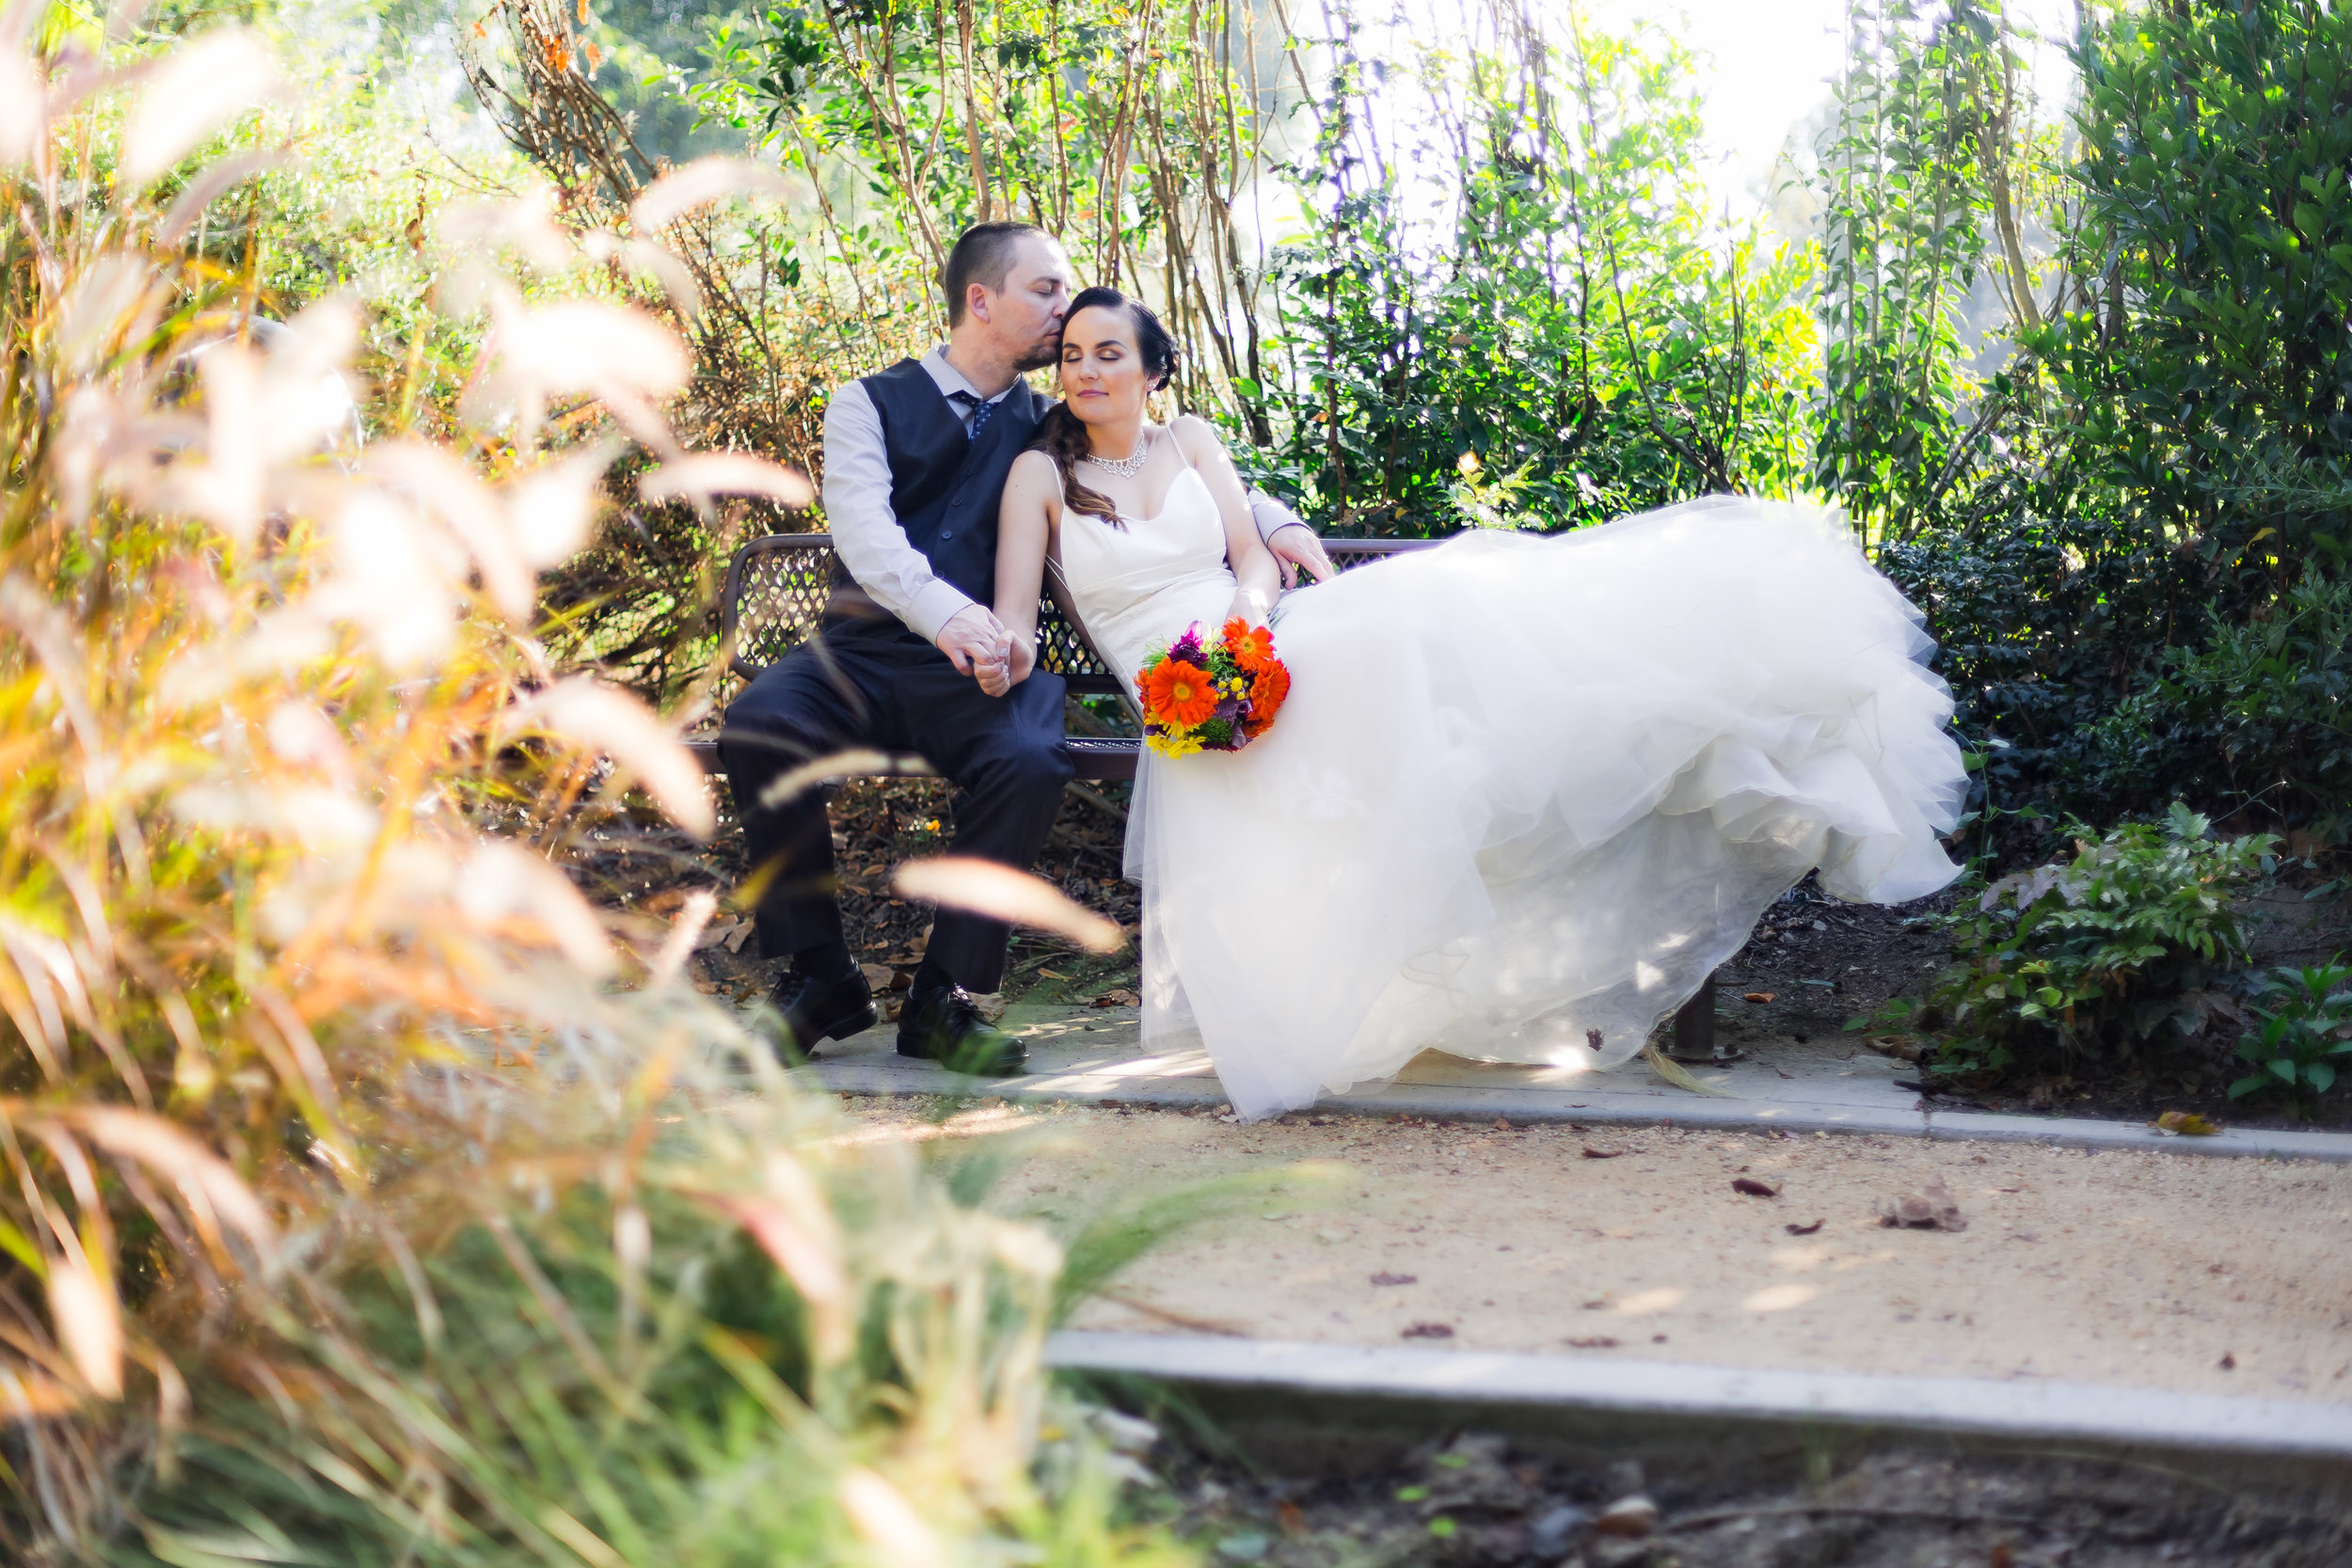 Orange_County_Lifestyle_Wedding-20.jpg